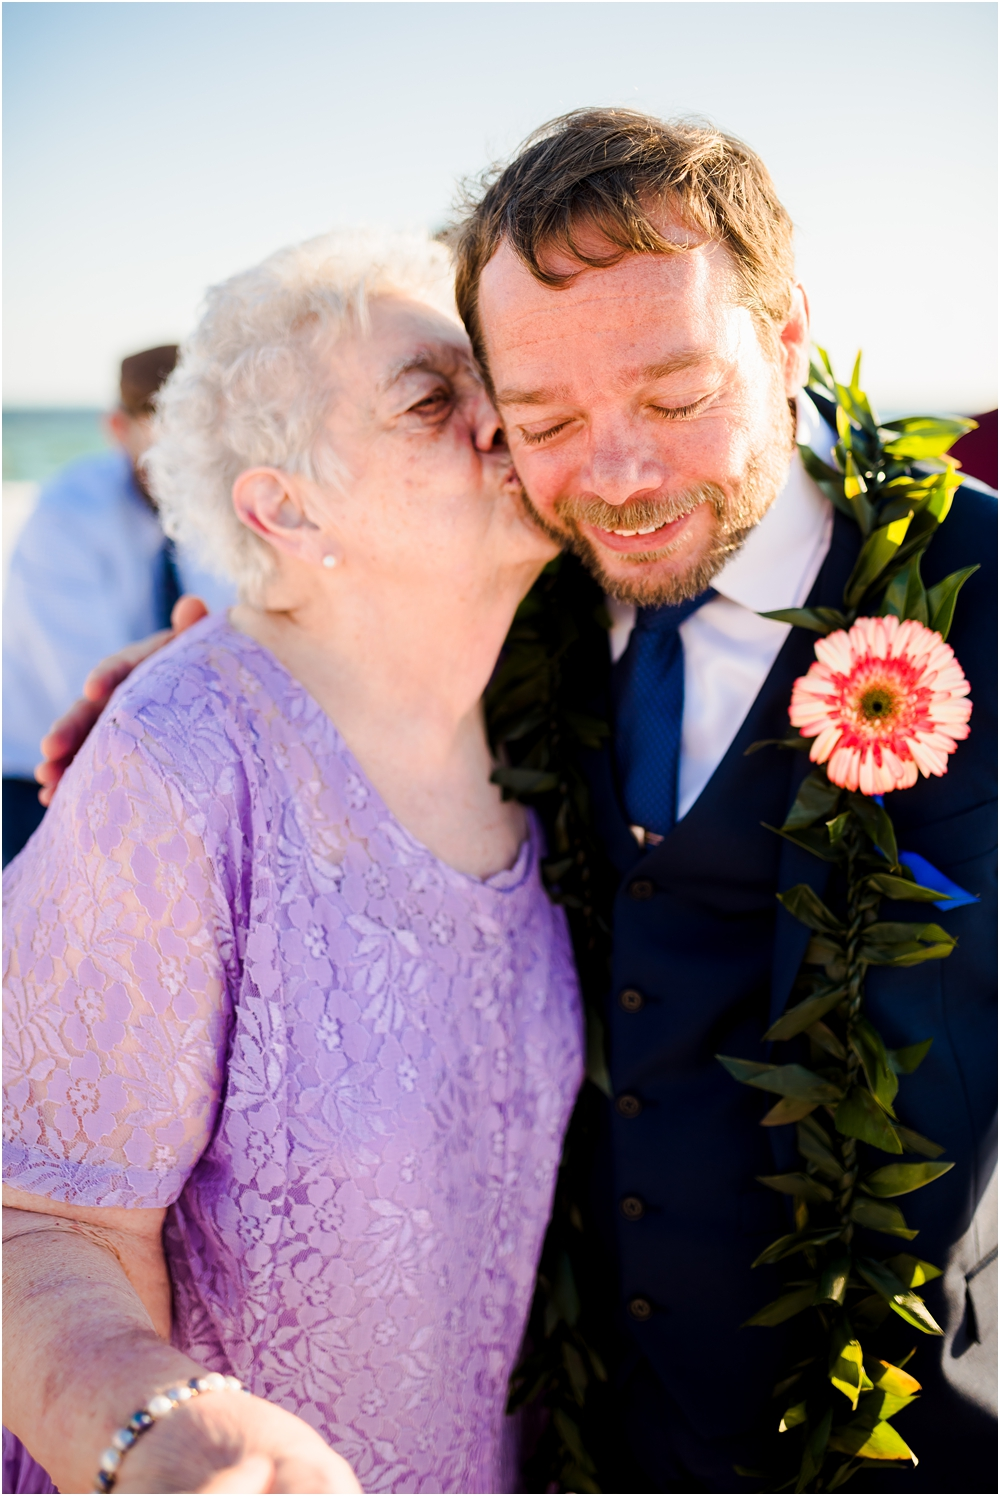 ledman-wedding-kiersten-stevenson-photography-30a-panama-city-beach-dothan-tallahassee-(297-of-763).JPG